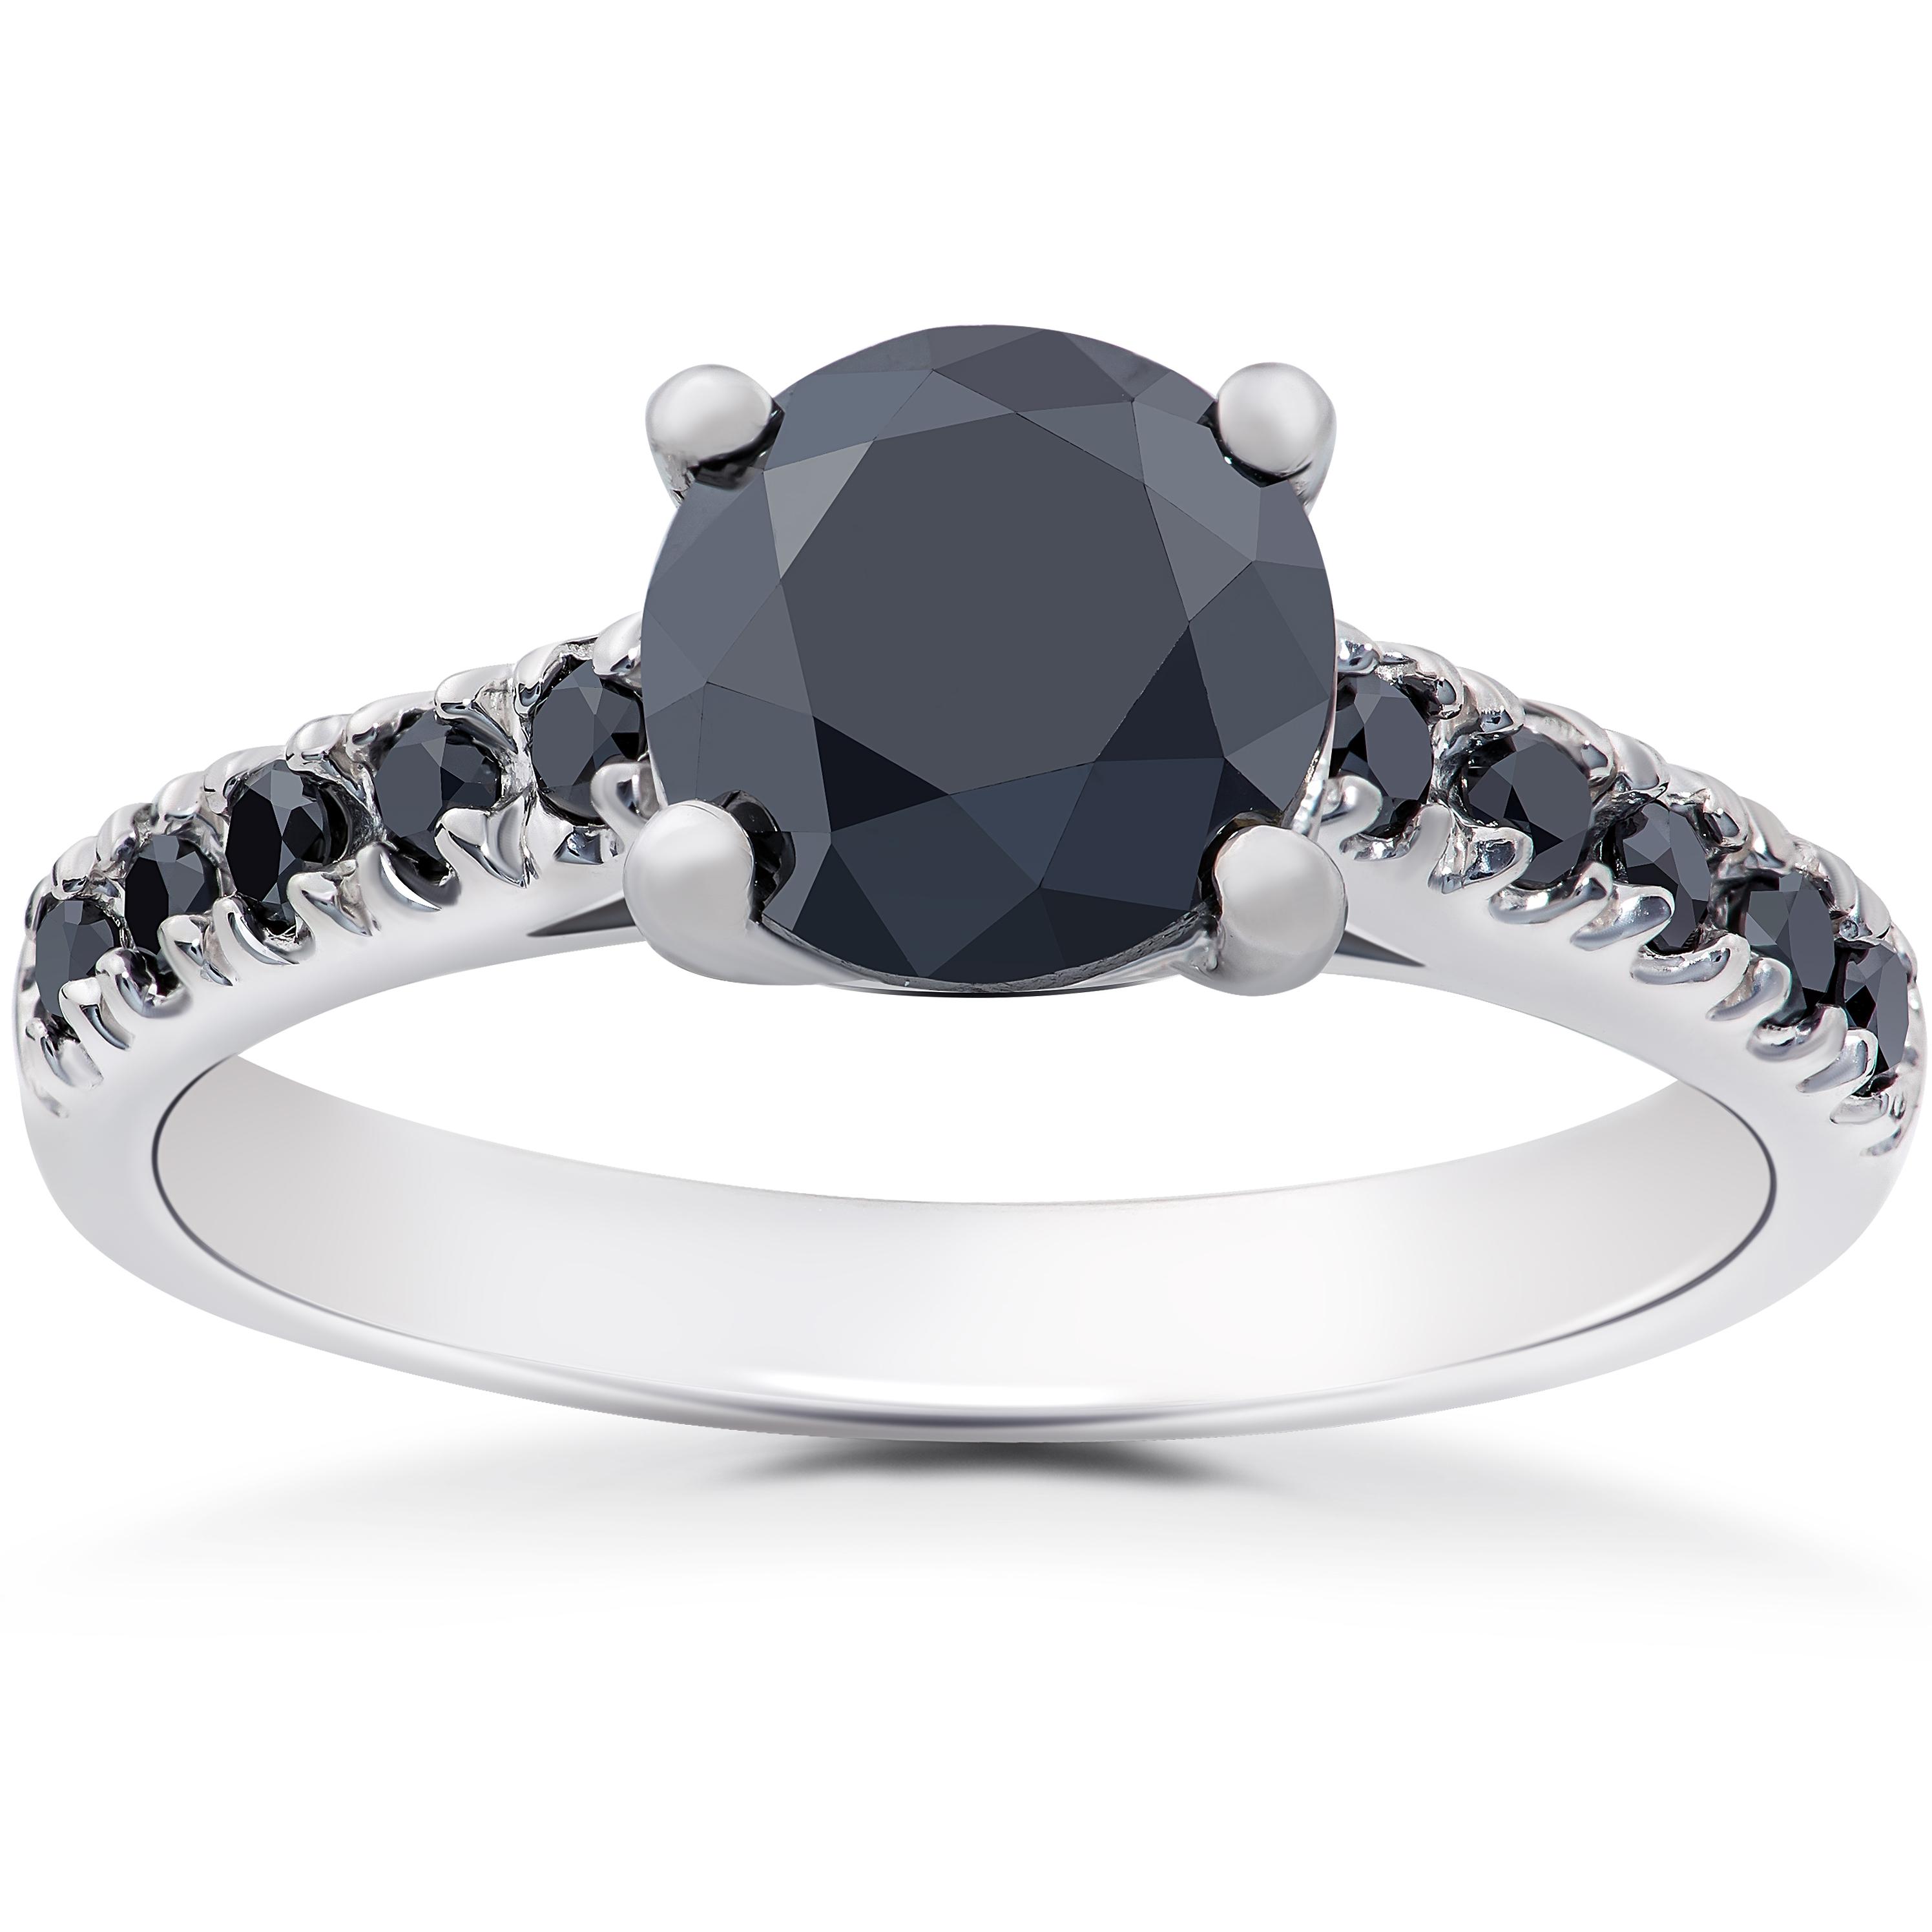 2 1 4 ct black diamond solitaire accent engagement ring. Black Bedroom Furniture Sets. Home Design Ideas